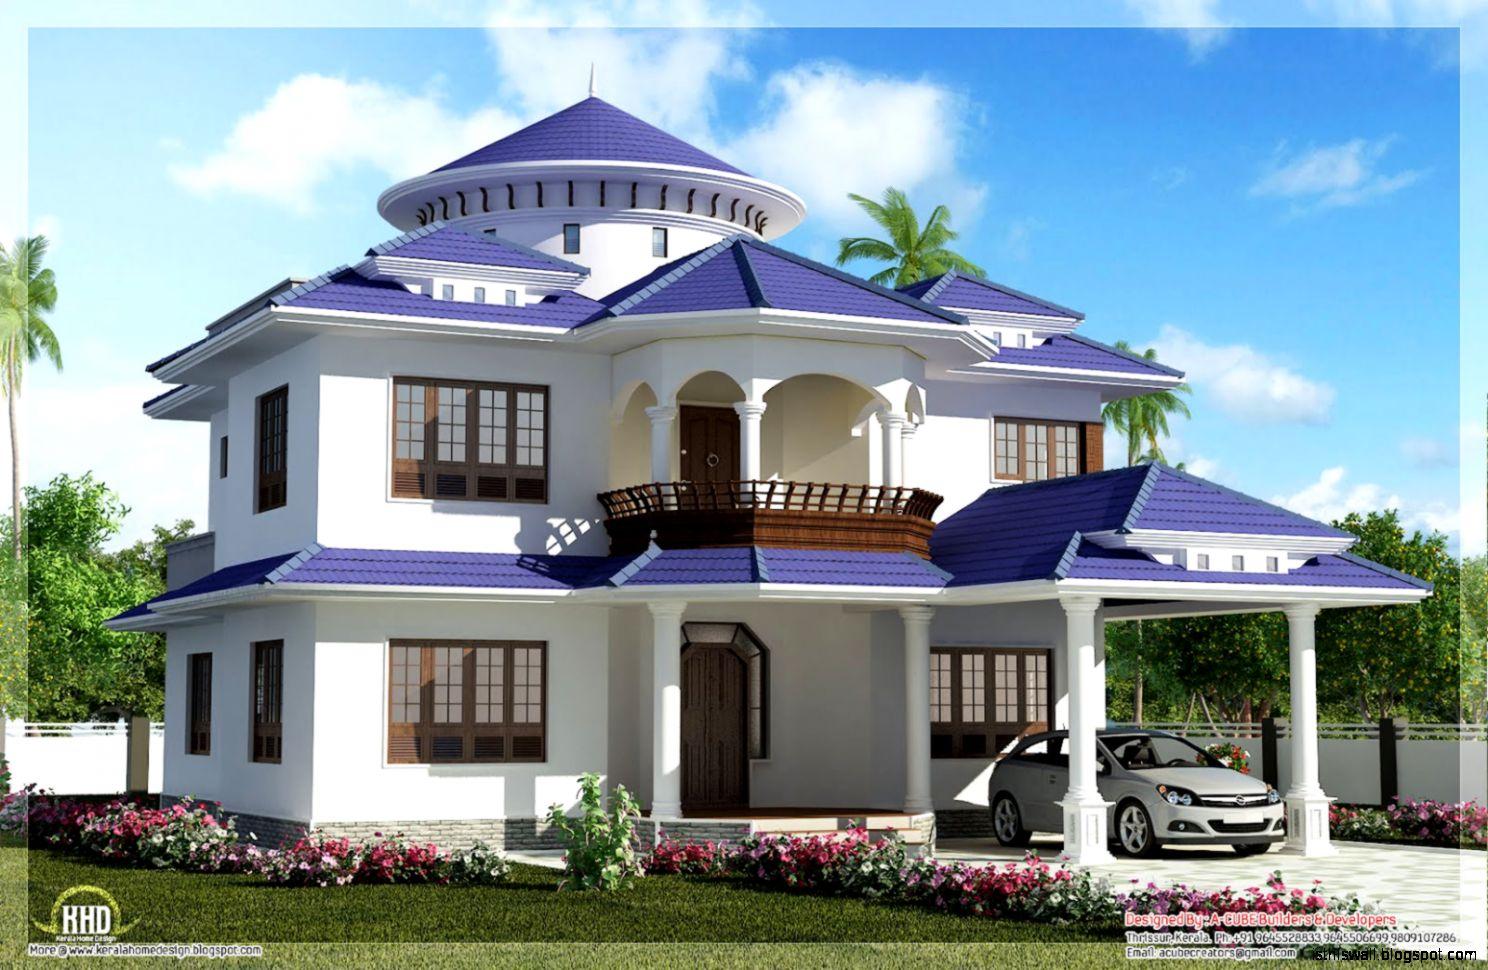 30 Modern Home Design Ideas